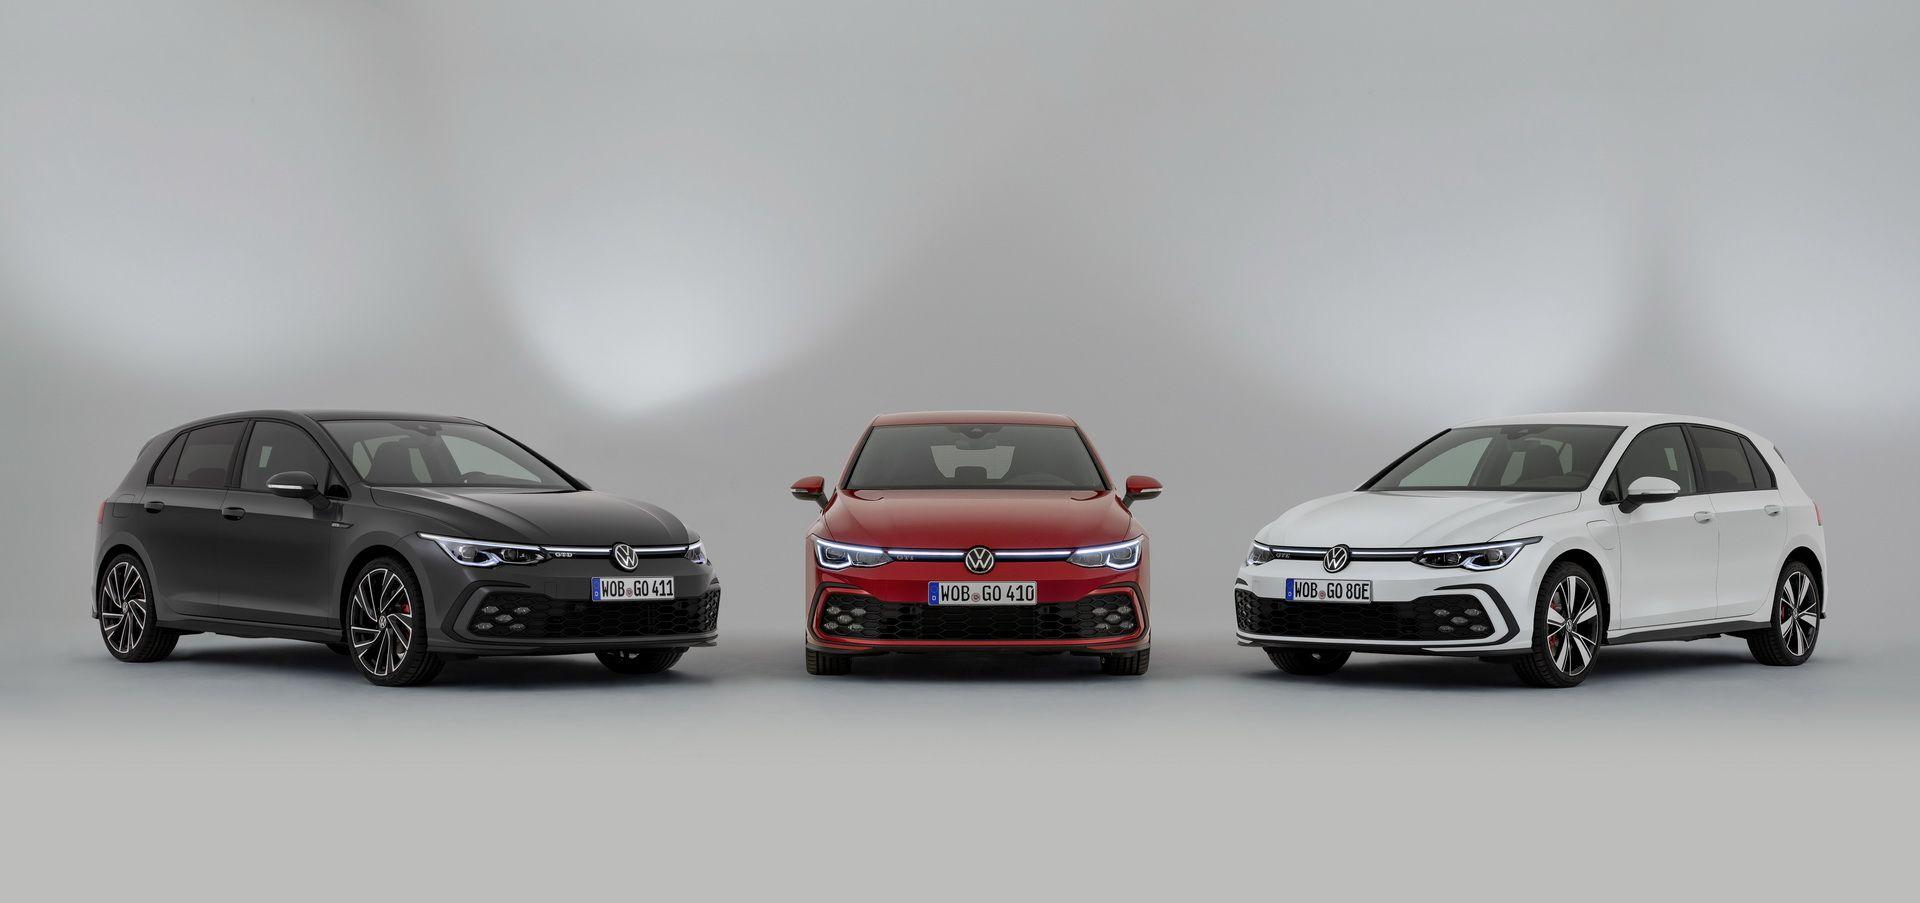 Novo Golf Gti Sera Lancado No Salao De Genebra Volkswagen Volkswagen Golf Novo Golf